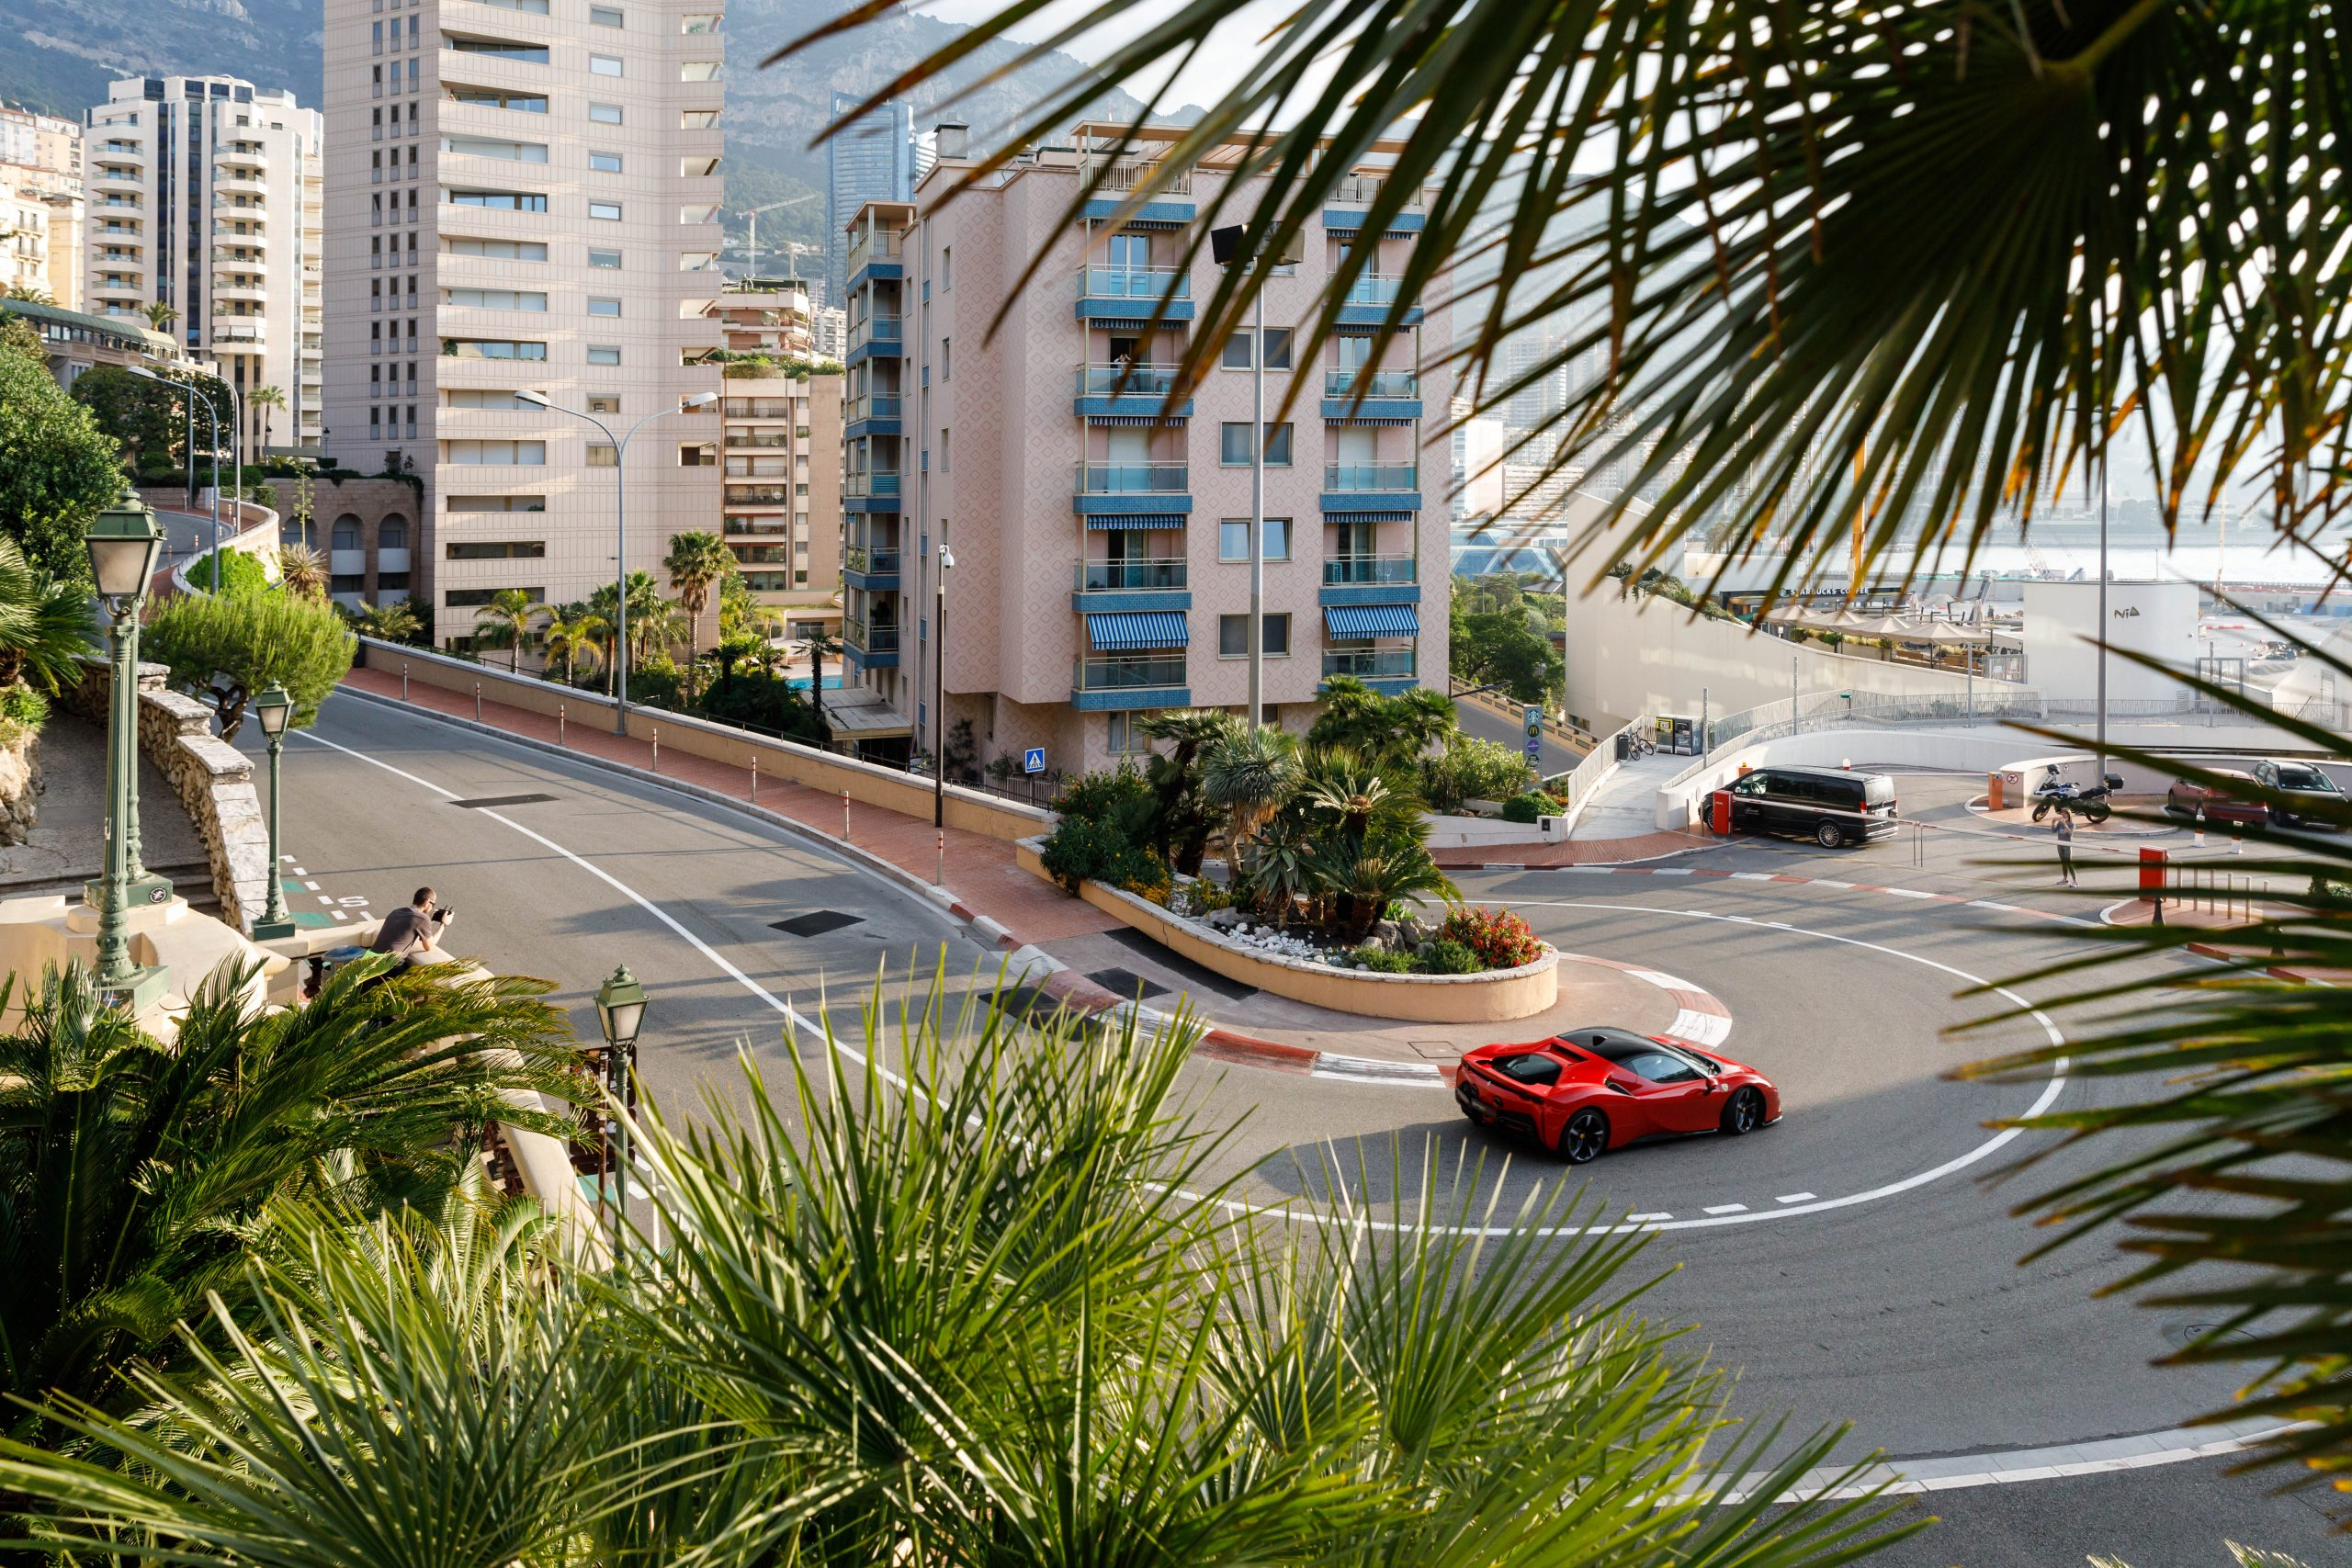 Ferrari_SF90_Stradale_Monaco_hairpin